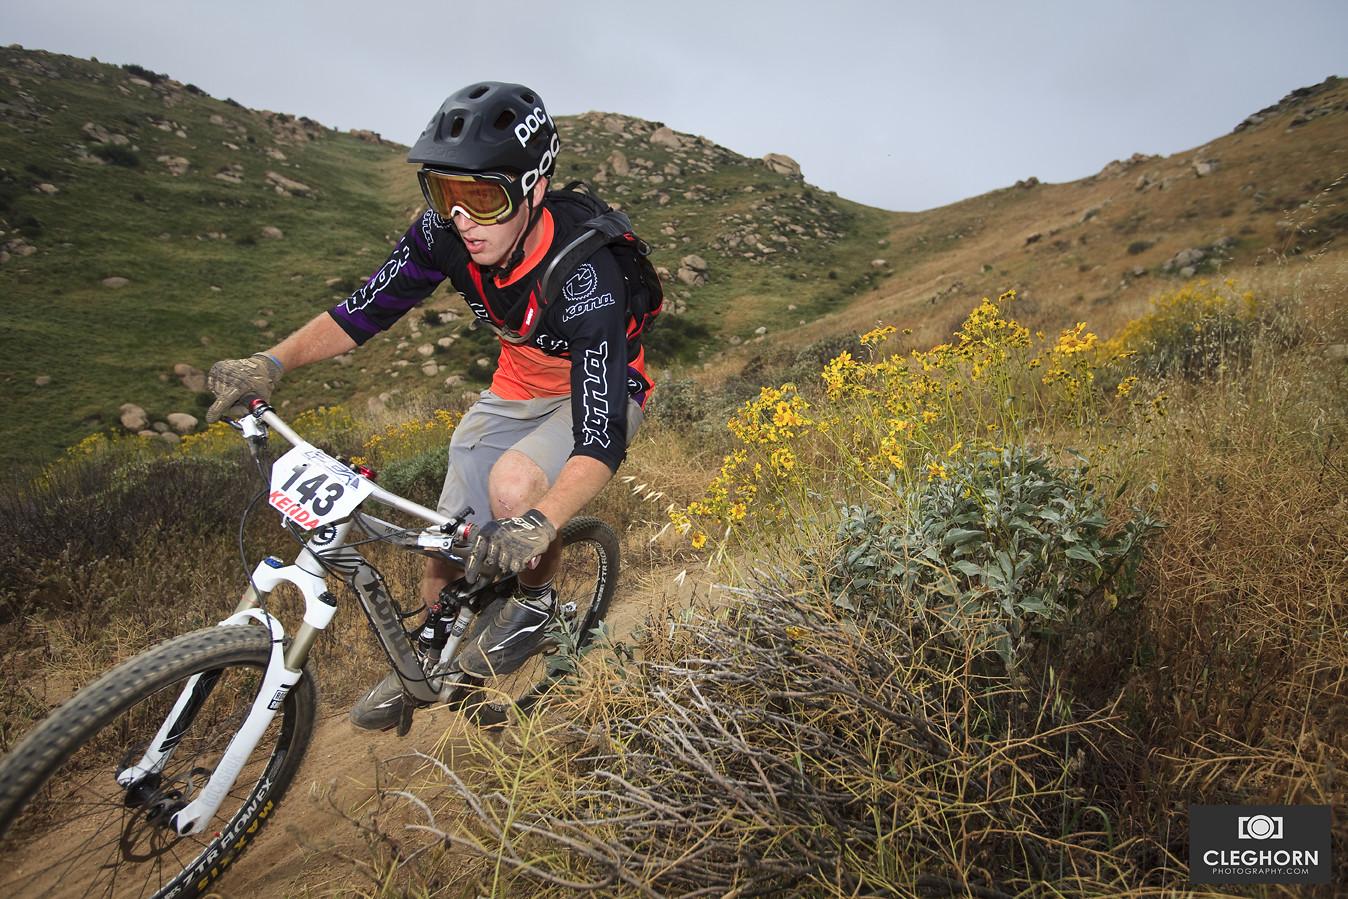 Jordan Steyer - Cleghorn Photography - Mountain Biking Pictures - Vital MTB